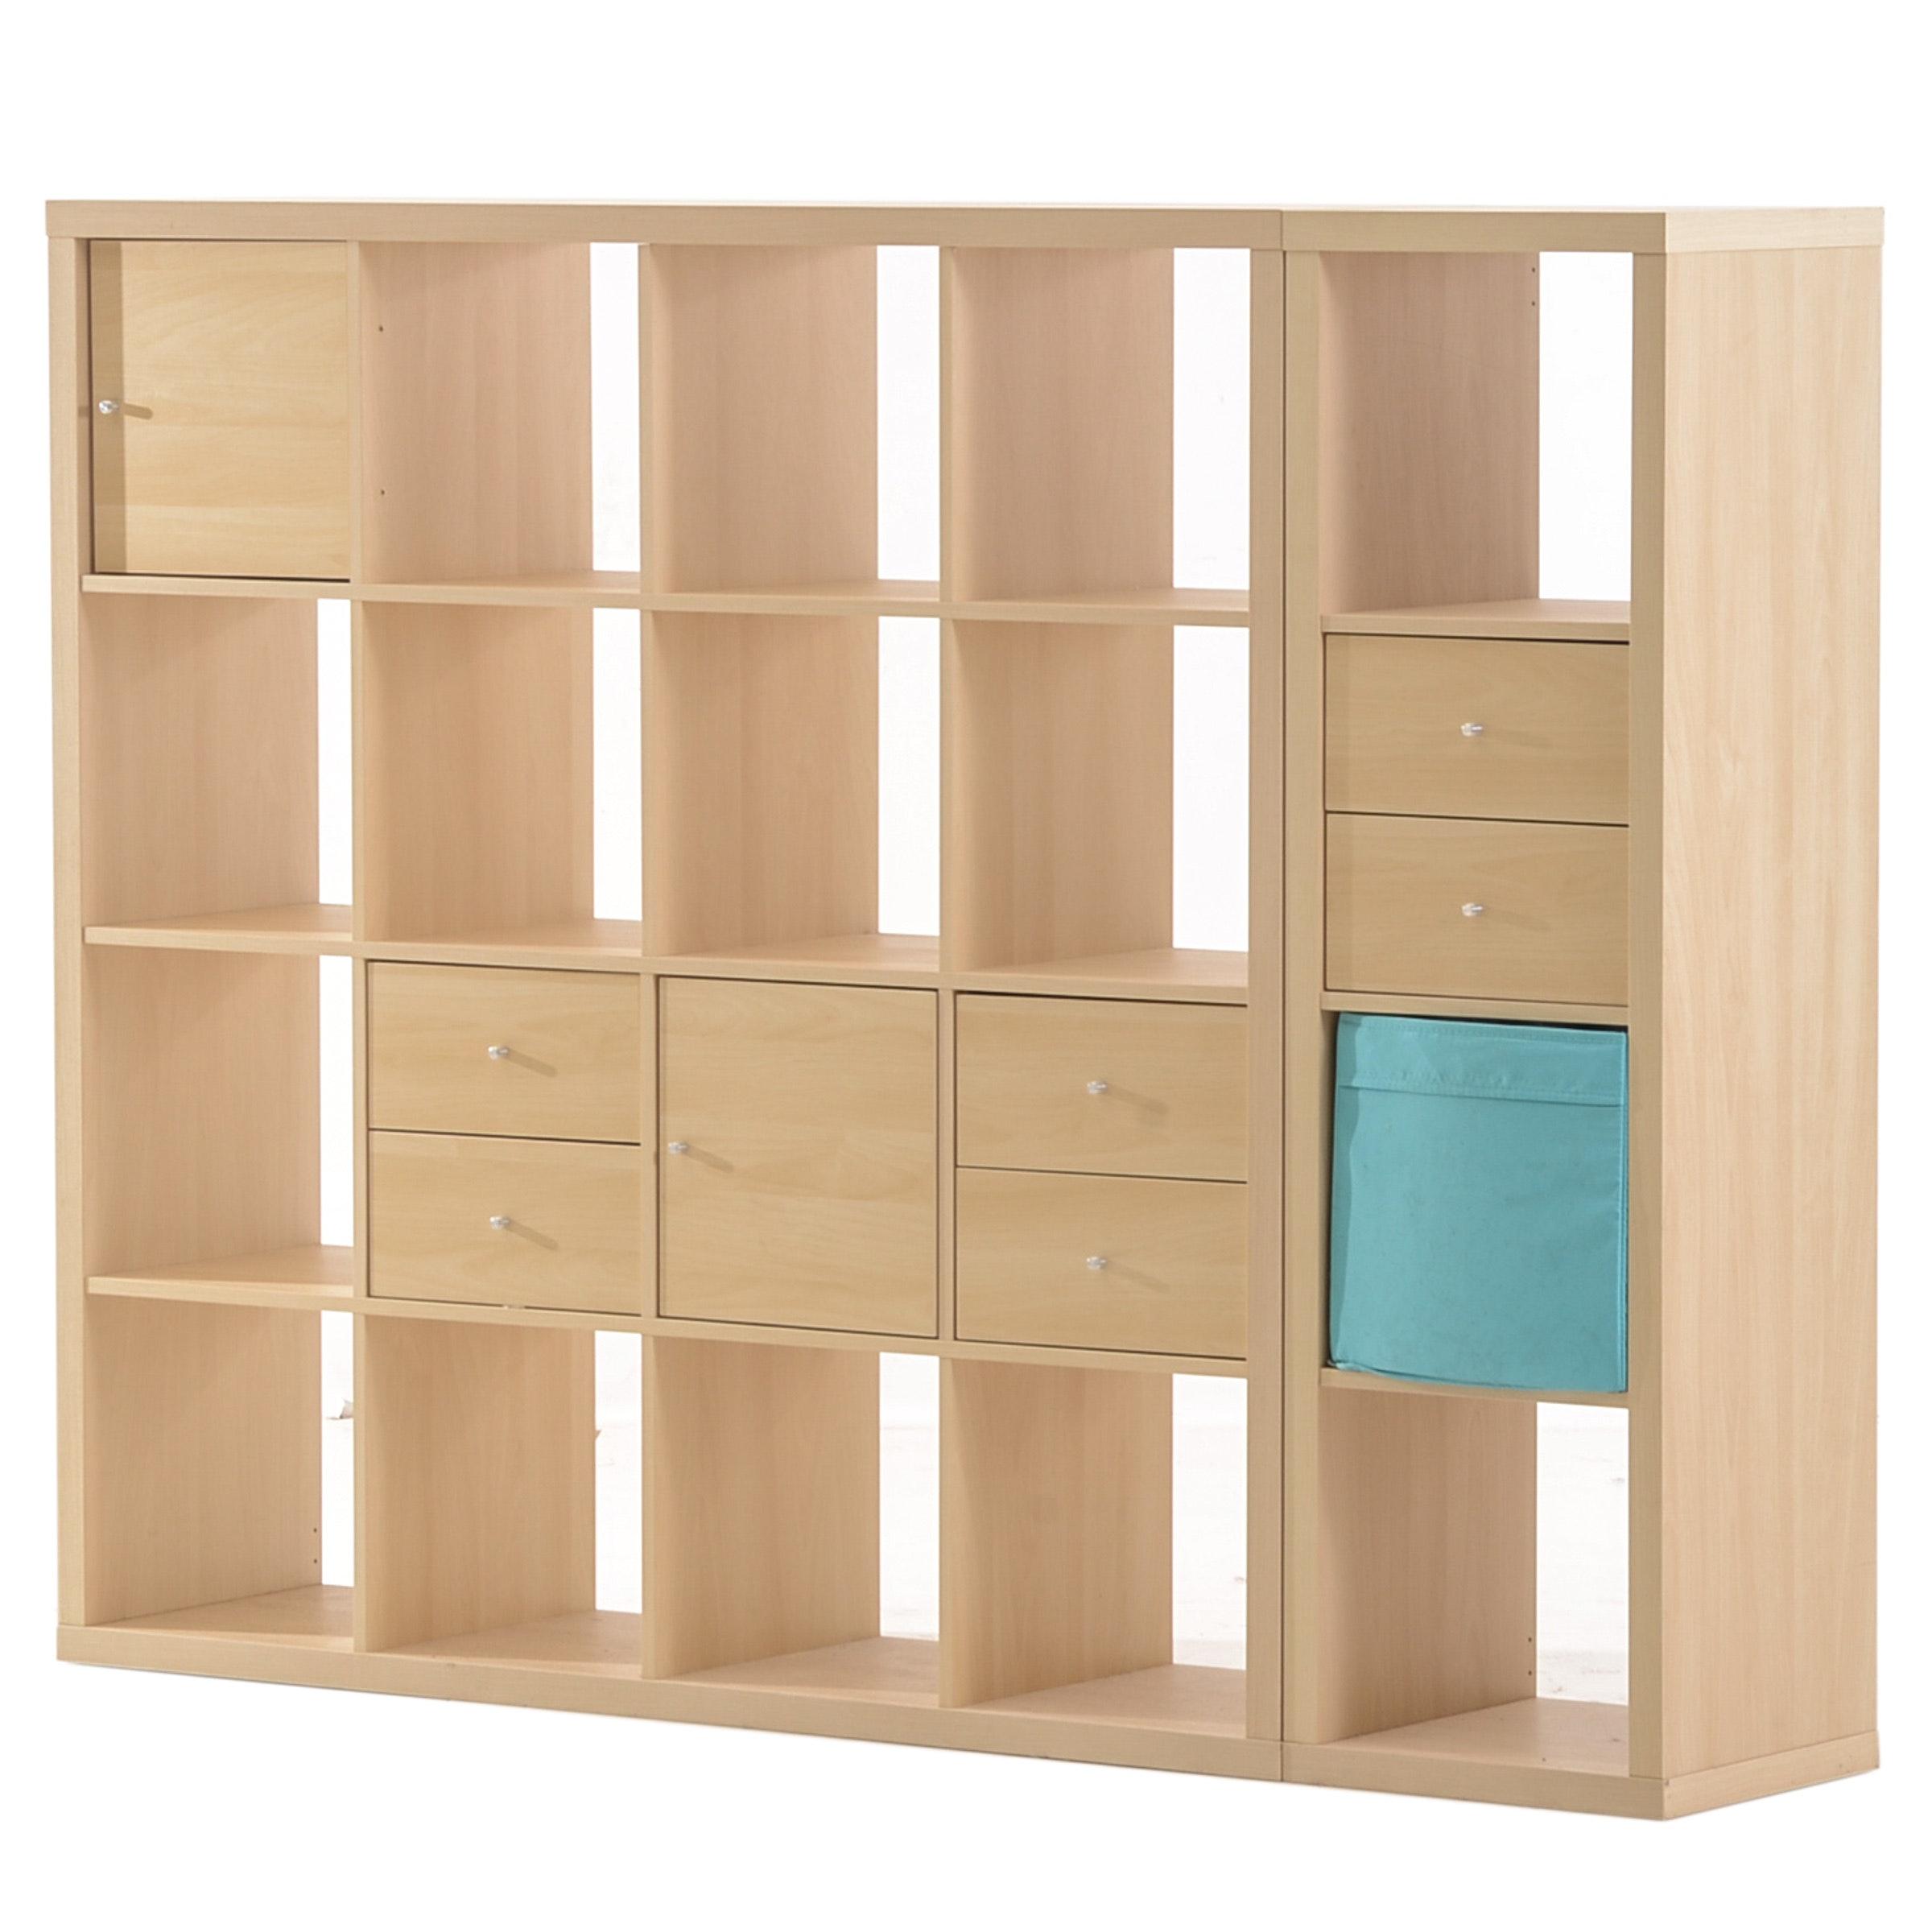 Ikea Maple Laminate Divided Shelving Units